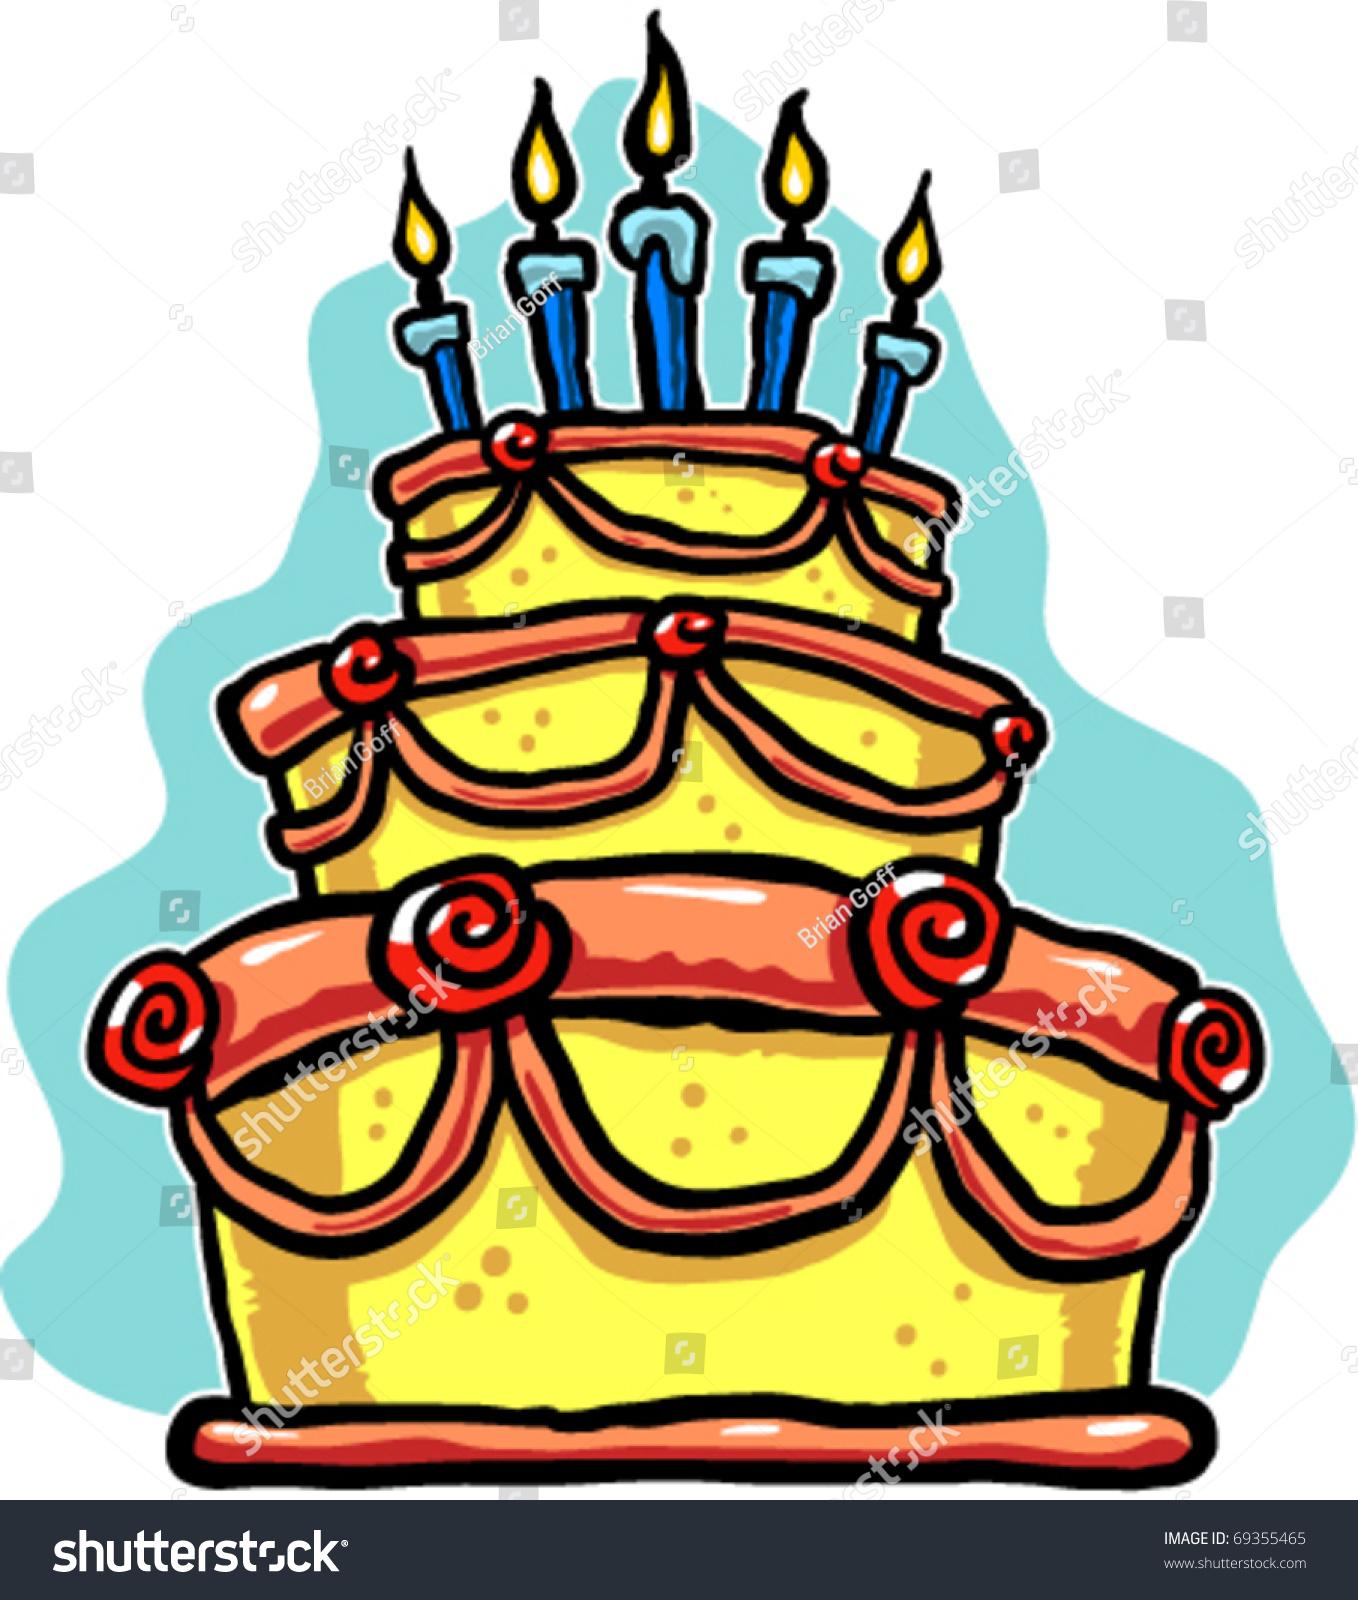 High Five Birthday Cake